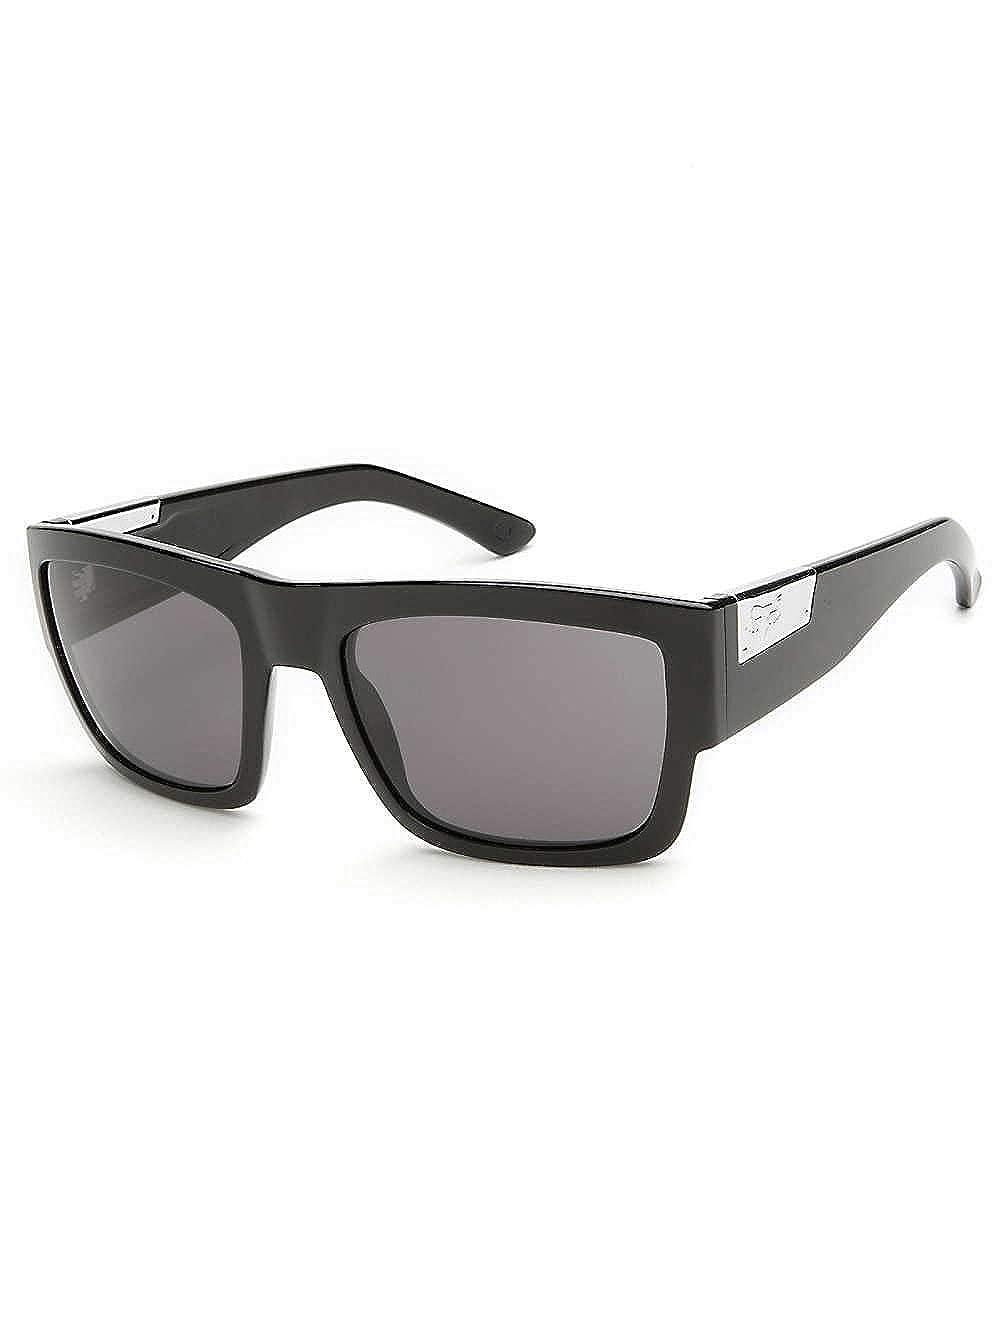 Hombre Gafas de Sol Fox Eyewear The Duncan Polished Black ...